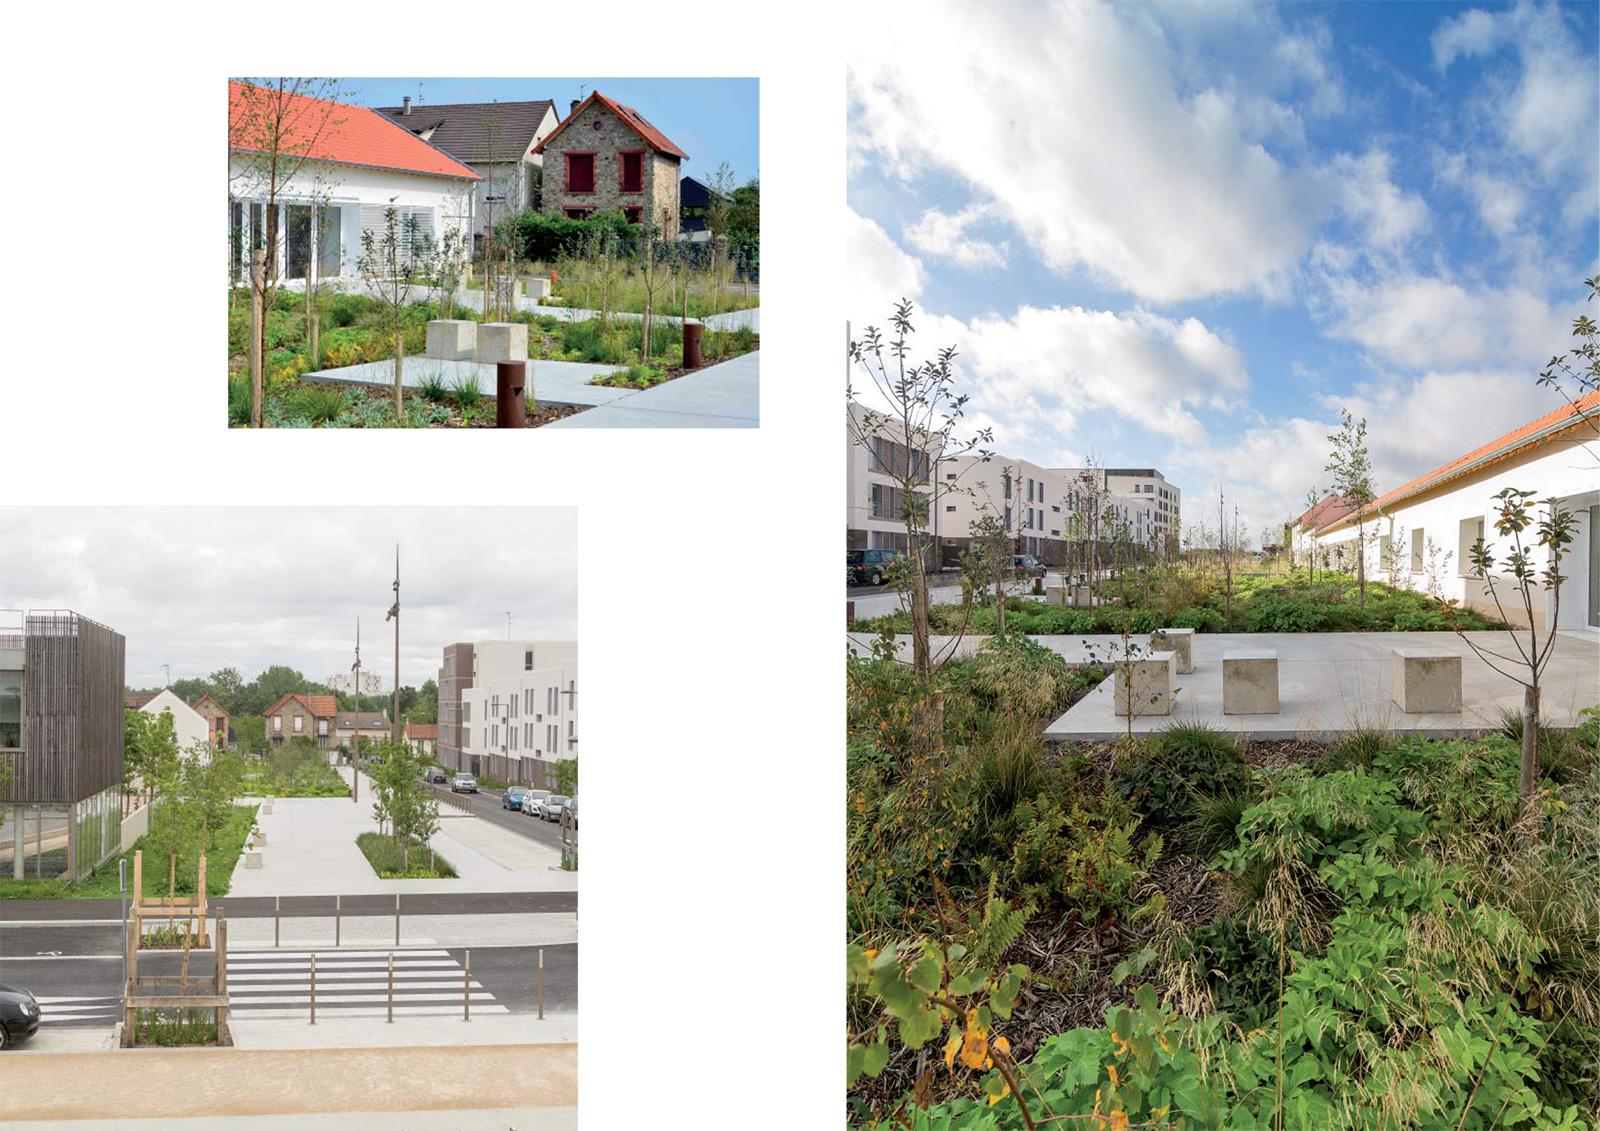 6-germe-et-jam-bretigny-clause-bois-badeau-projet-urbain--ECOLE